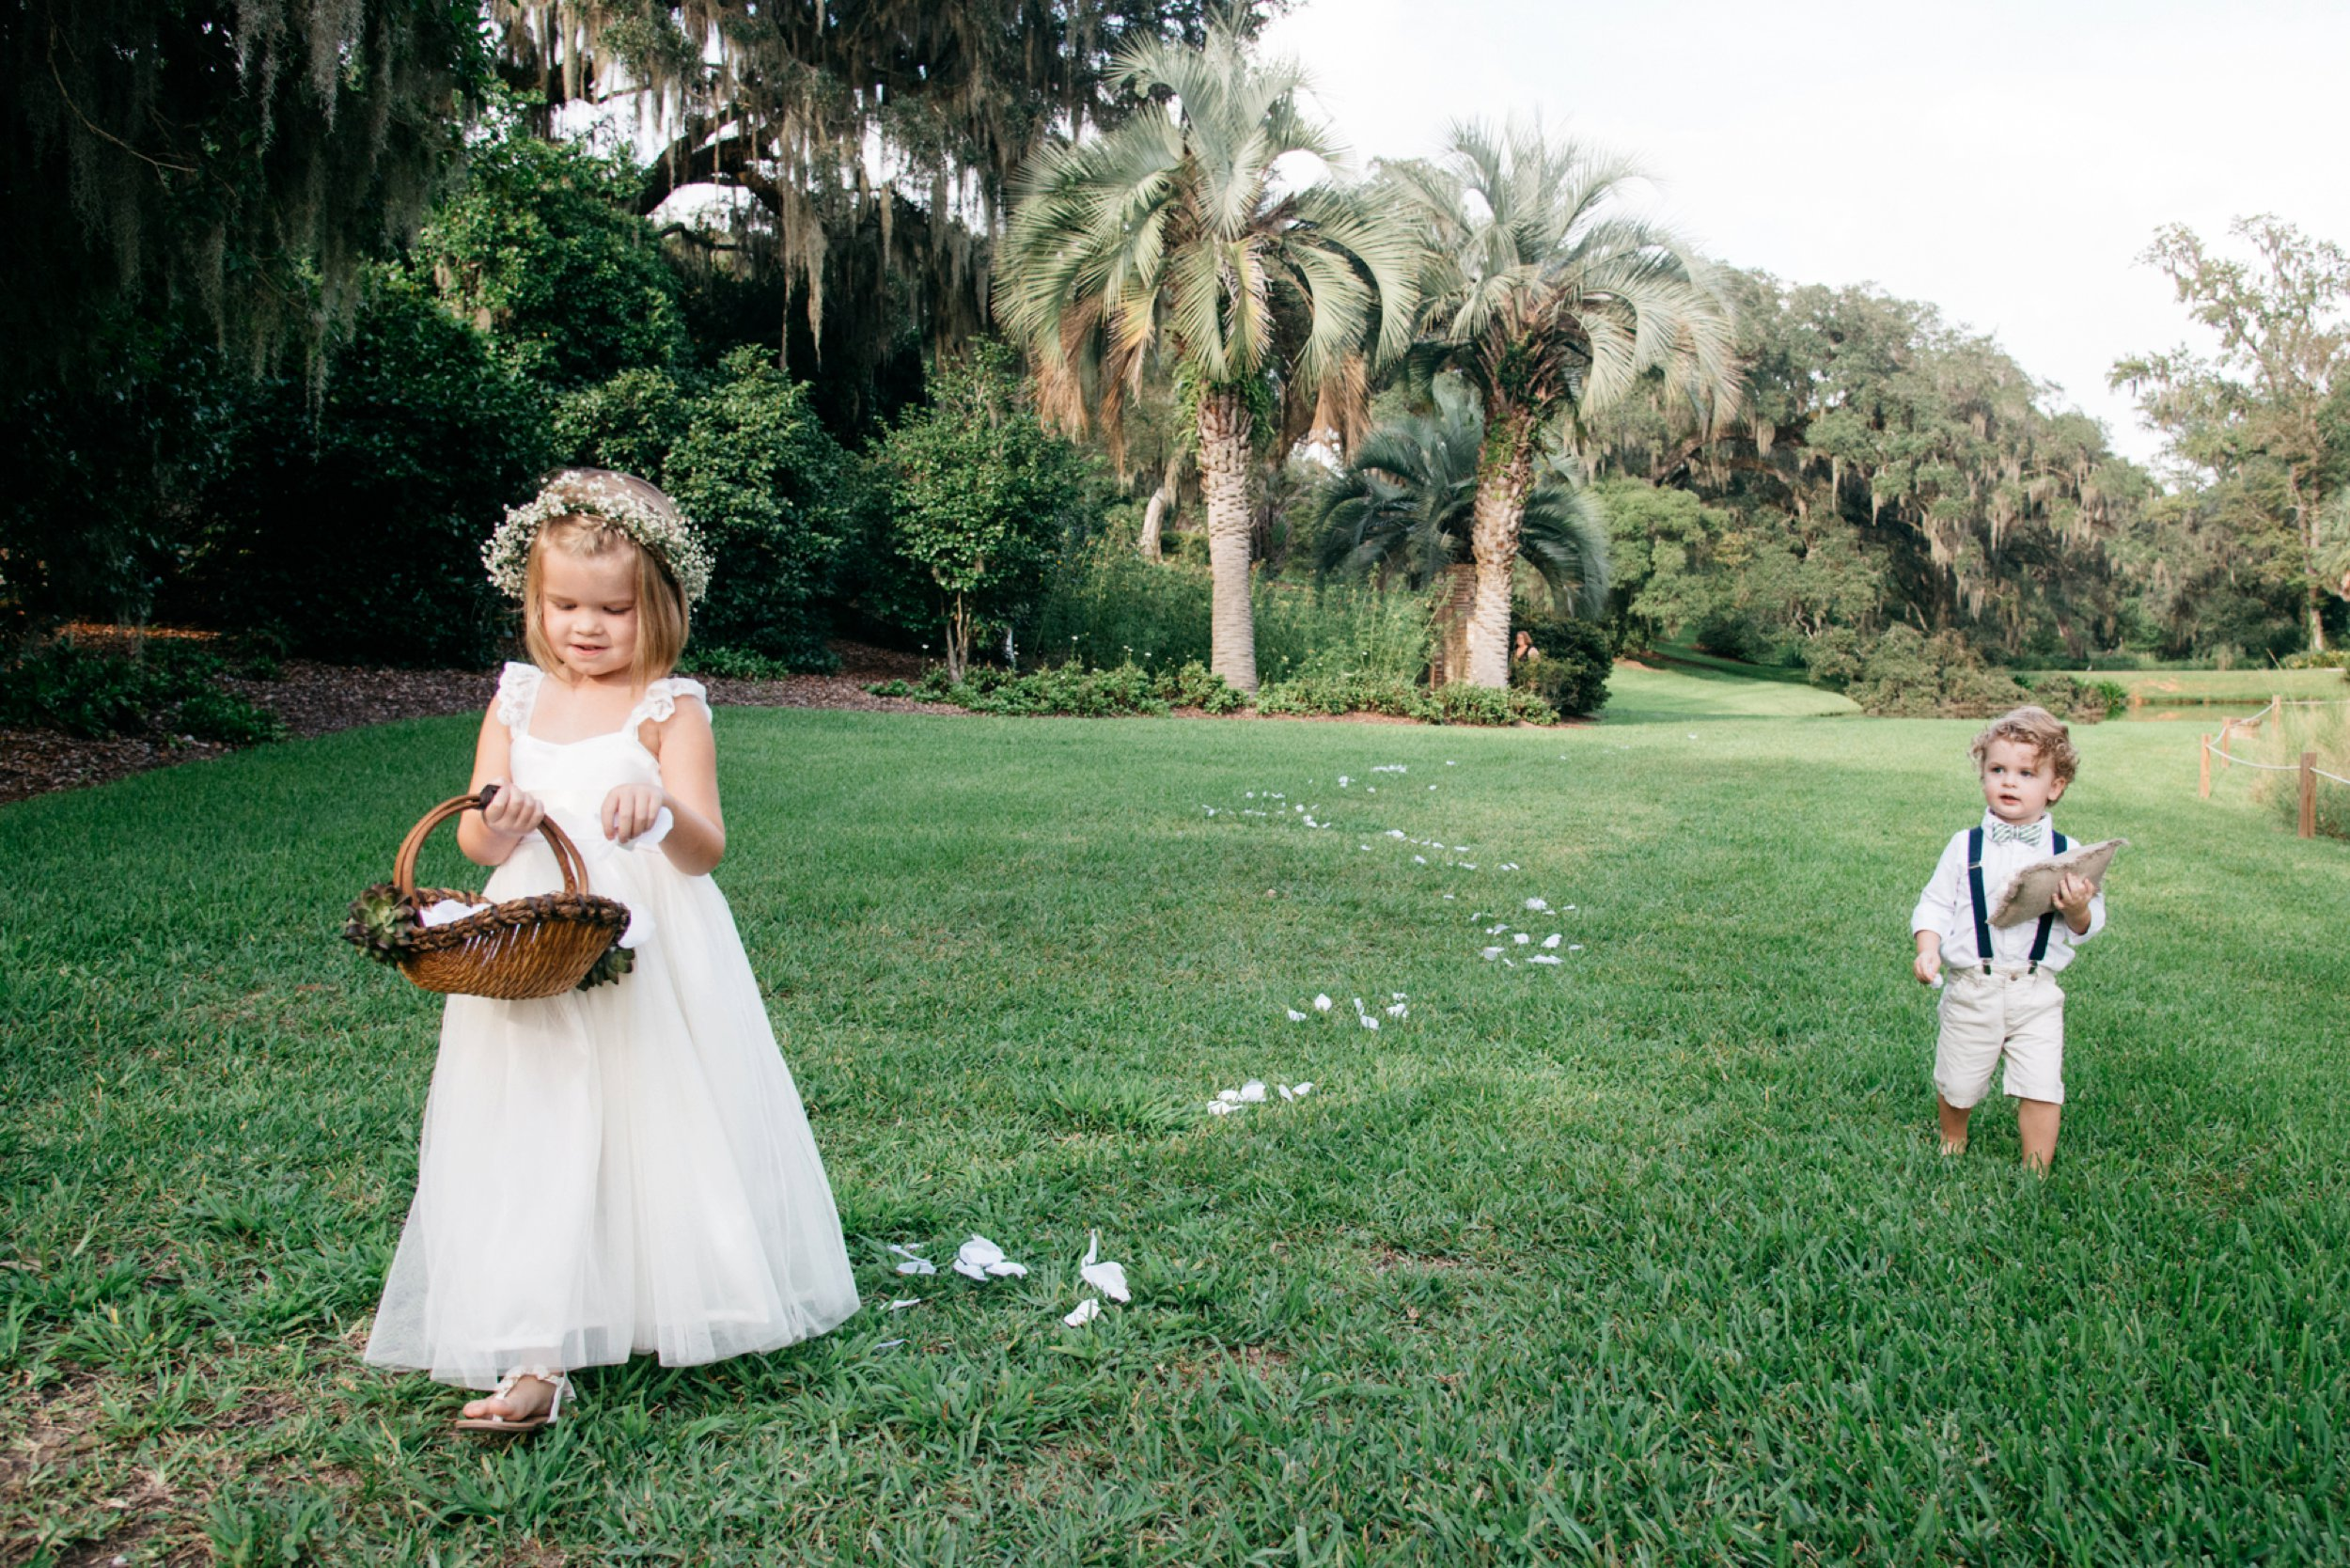 mepkin-abbey-wedding-18.jpg